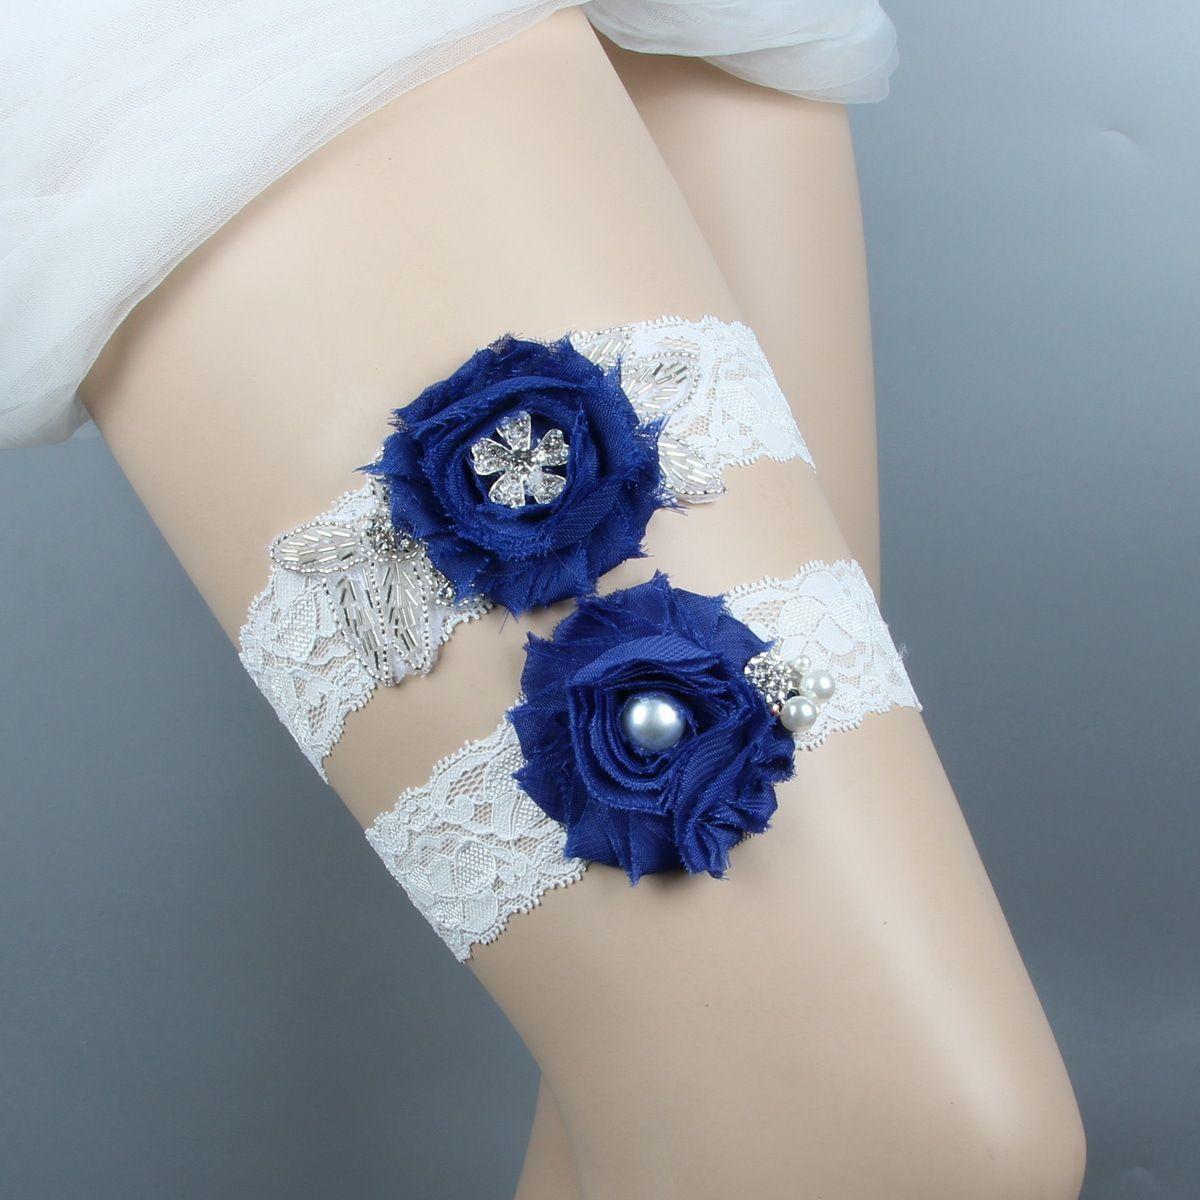 Blue Wedding Garters For Bride Bridal Leg Garters Belt set Lace Rhinestones Crystals Pearls Plus Size Chiffon Flowers handmade